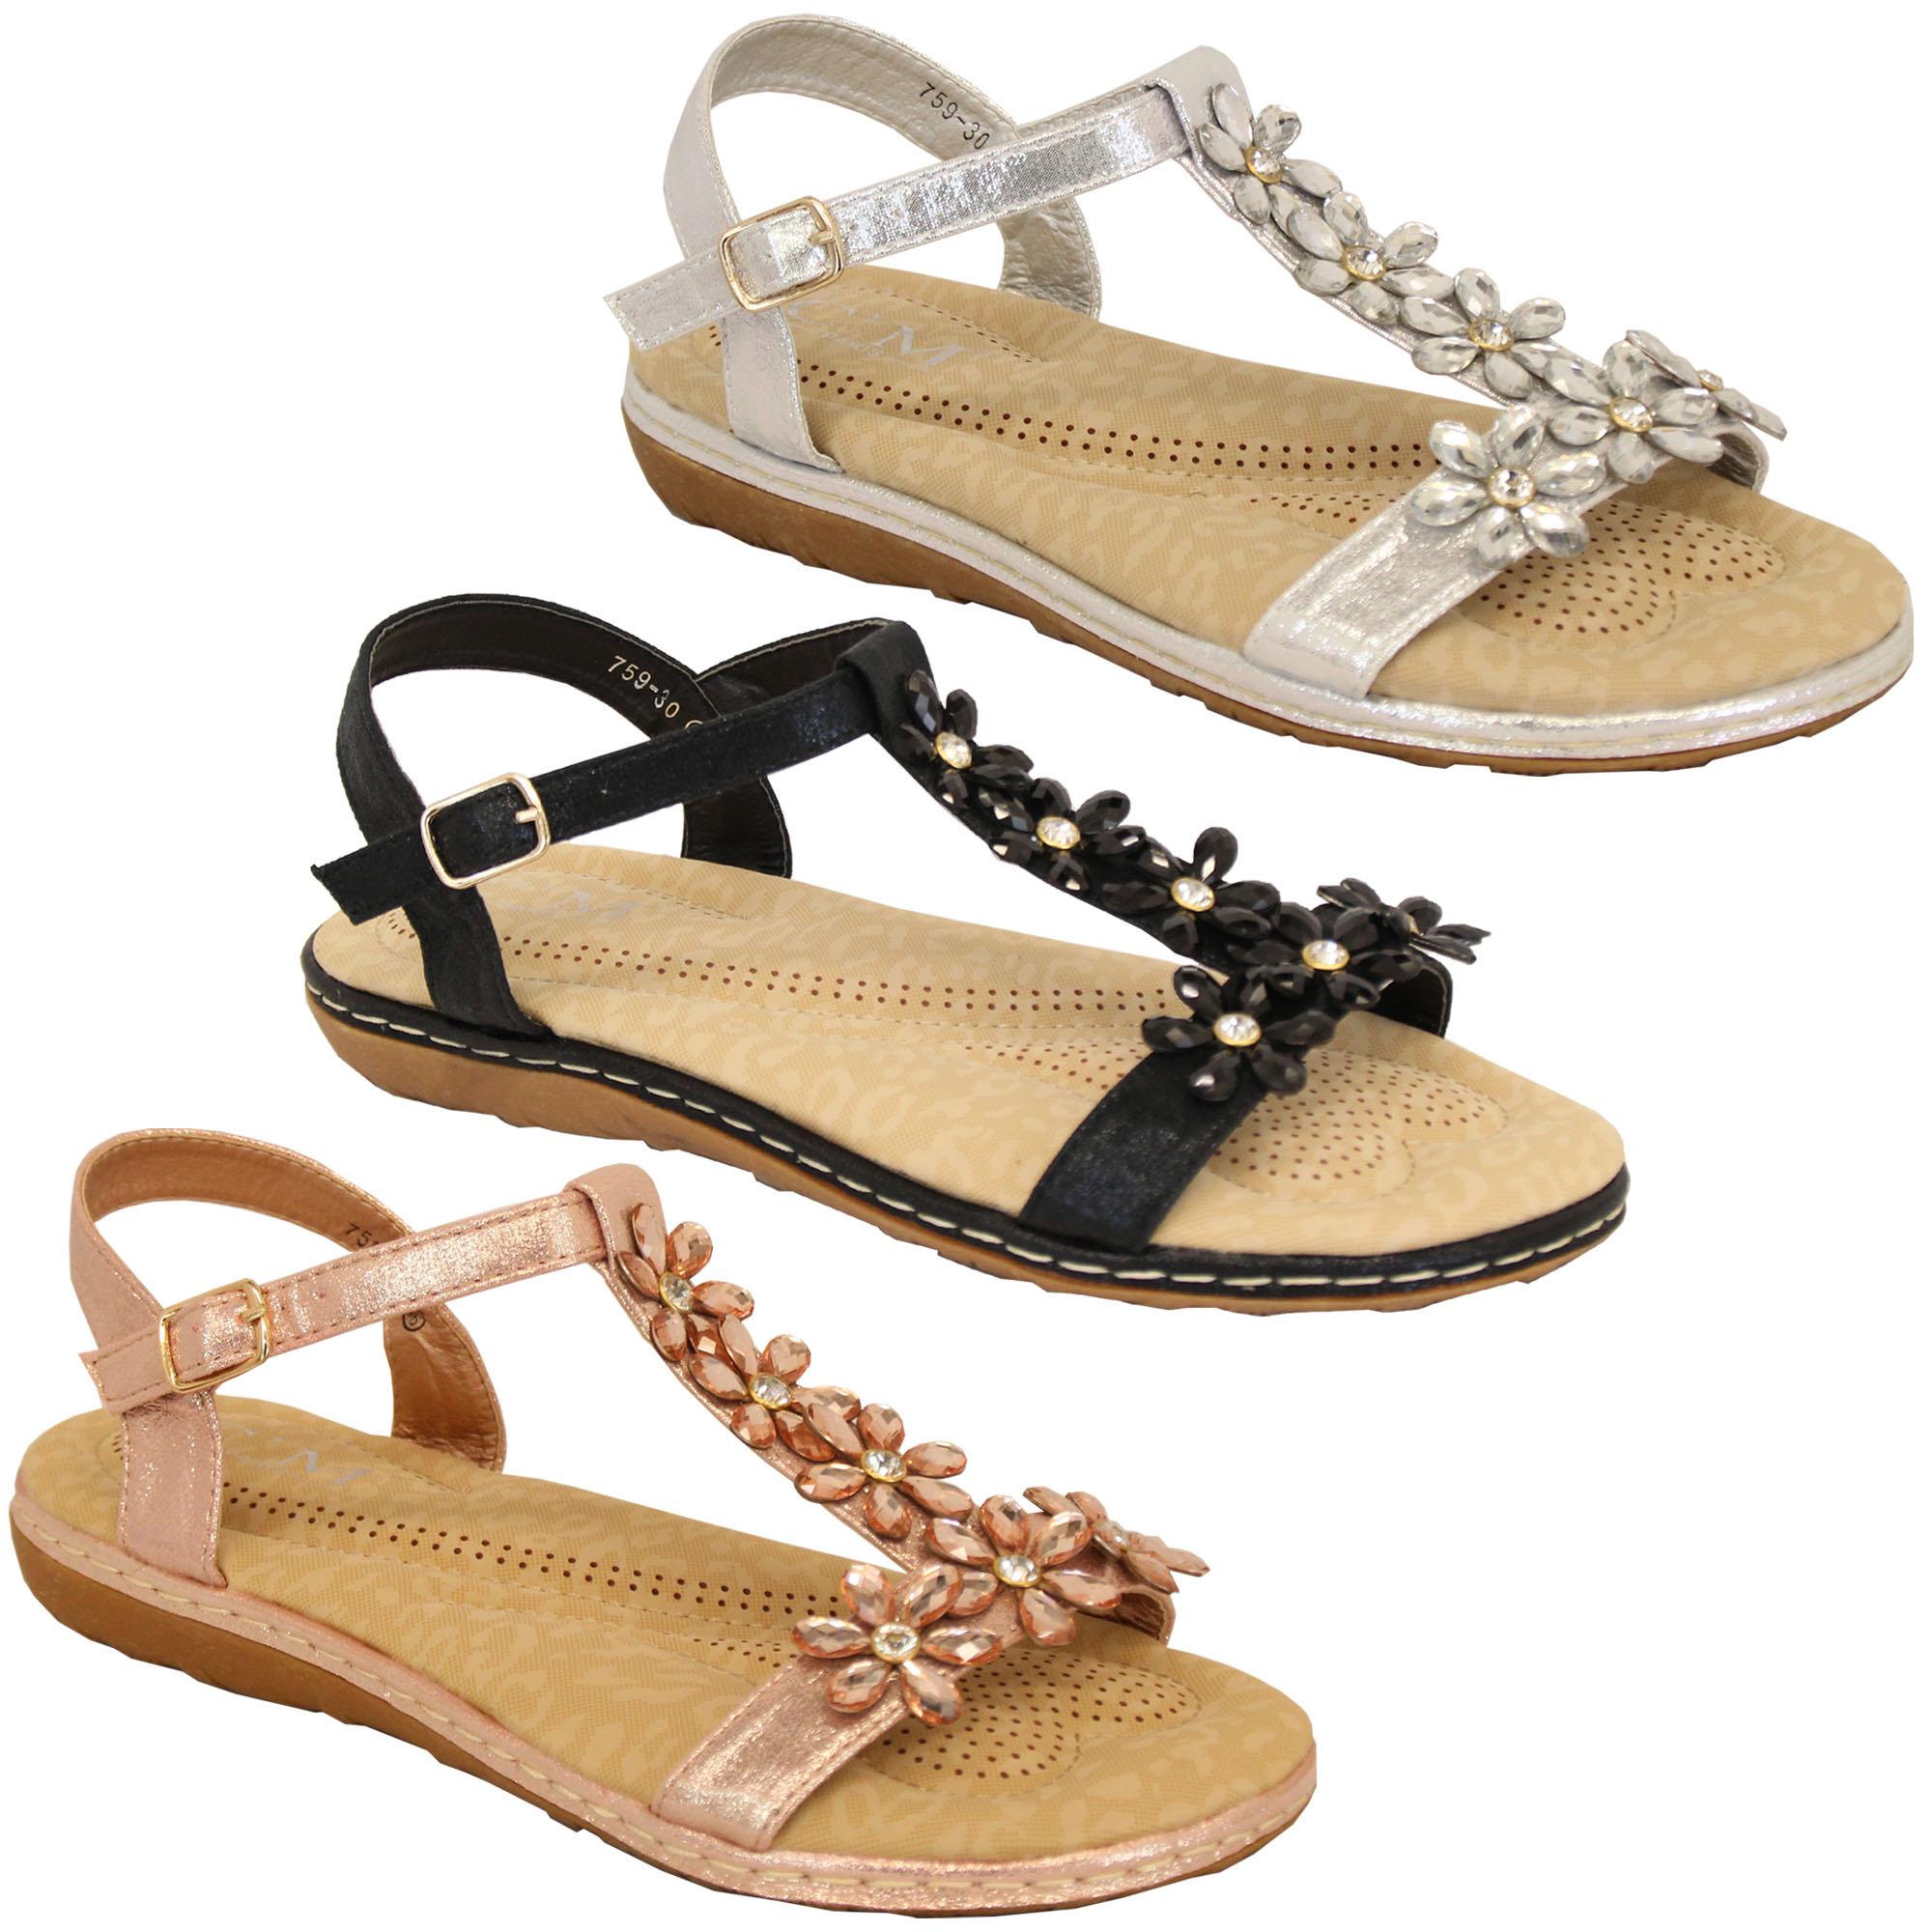 a0c5e8d9b Ladies Flat Sandals Womens Rhinestone Flowers Open Toe Shoes Summer ...